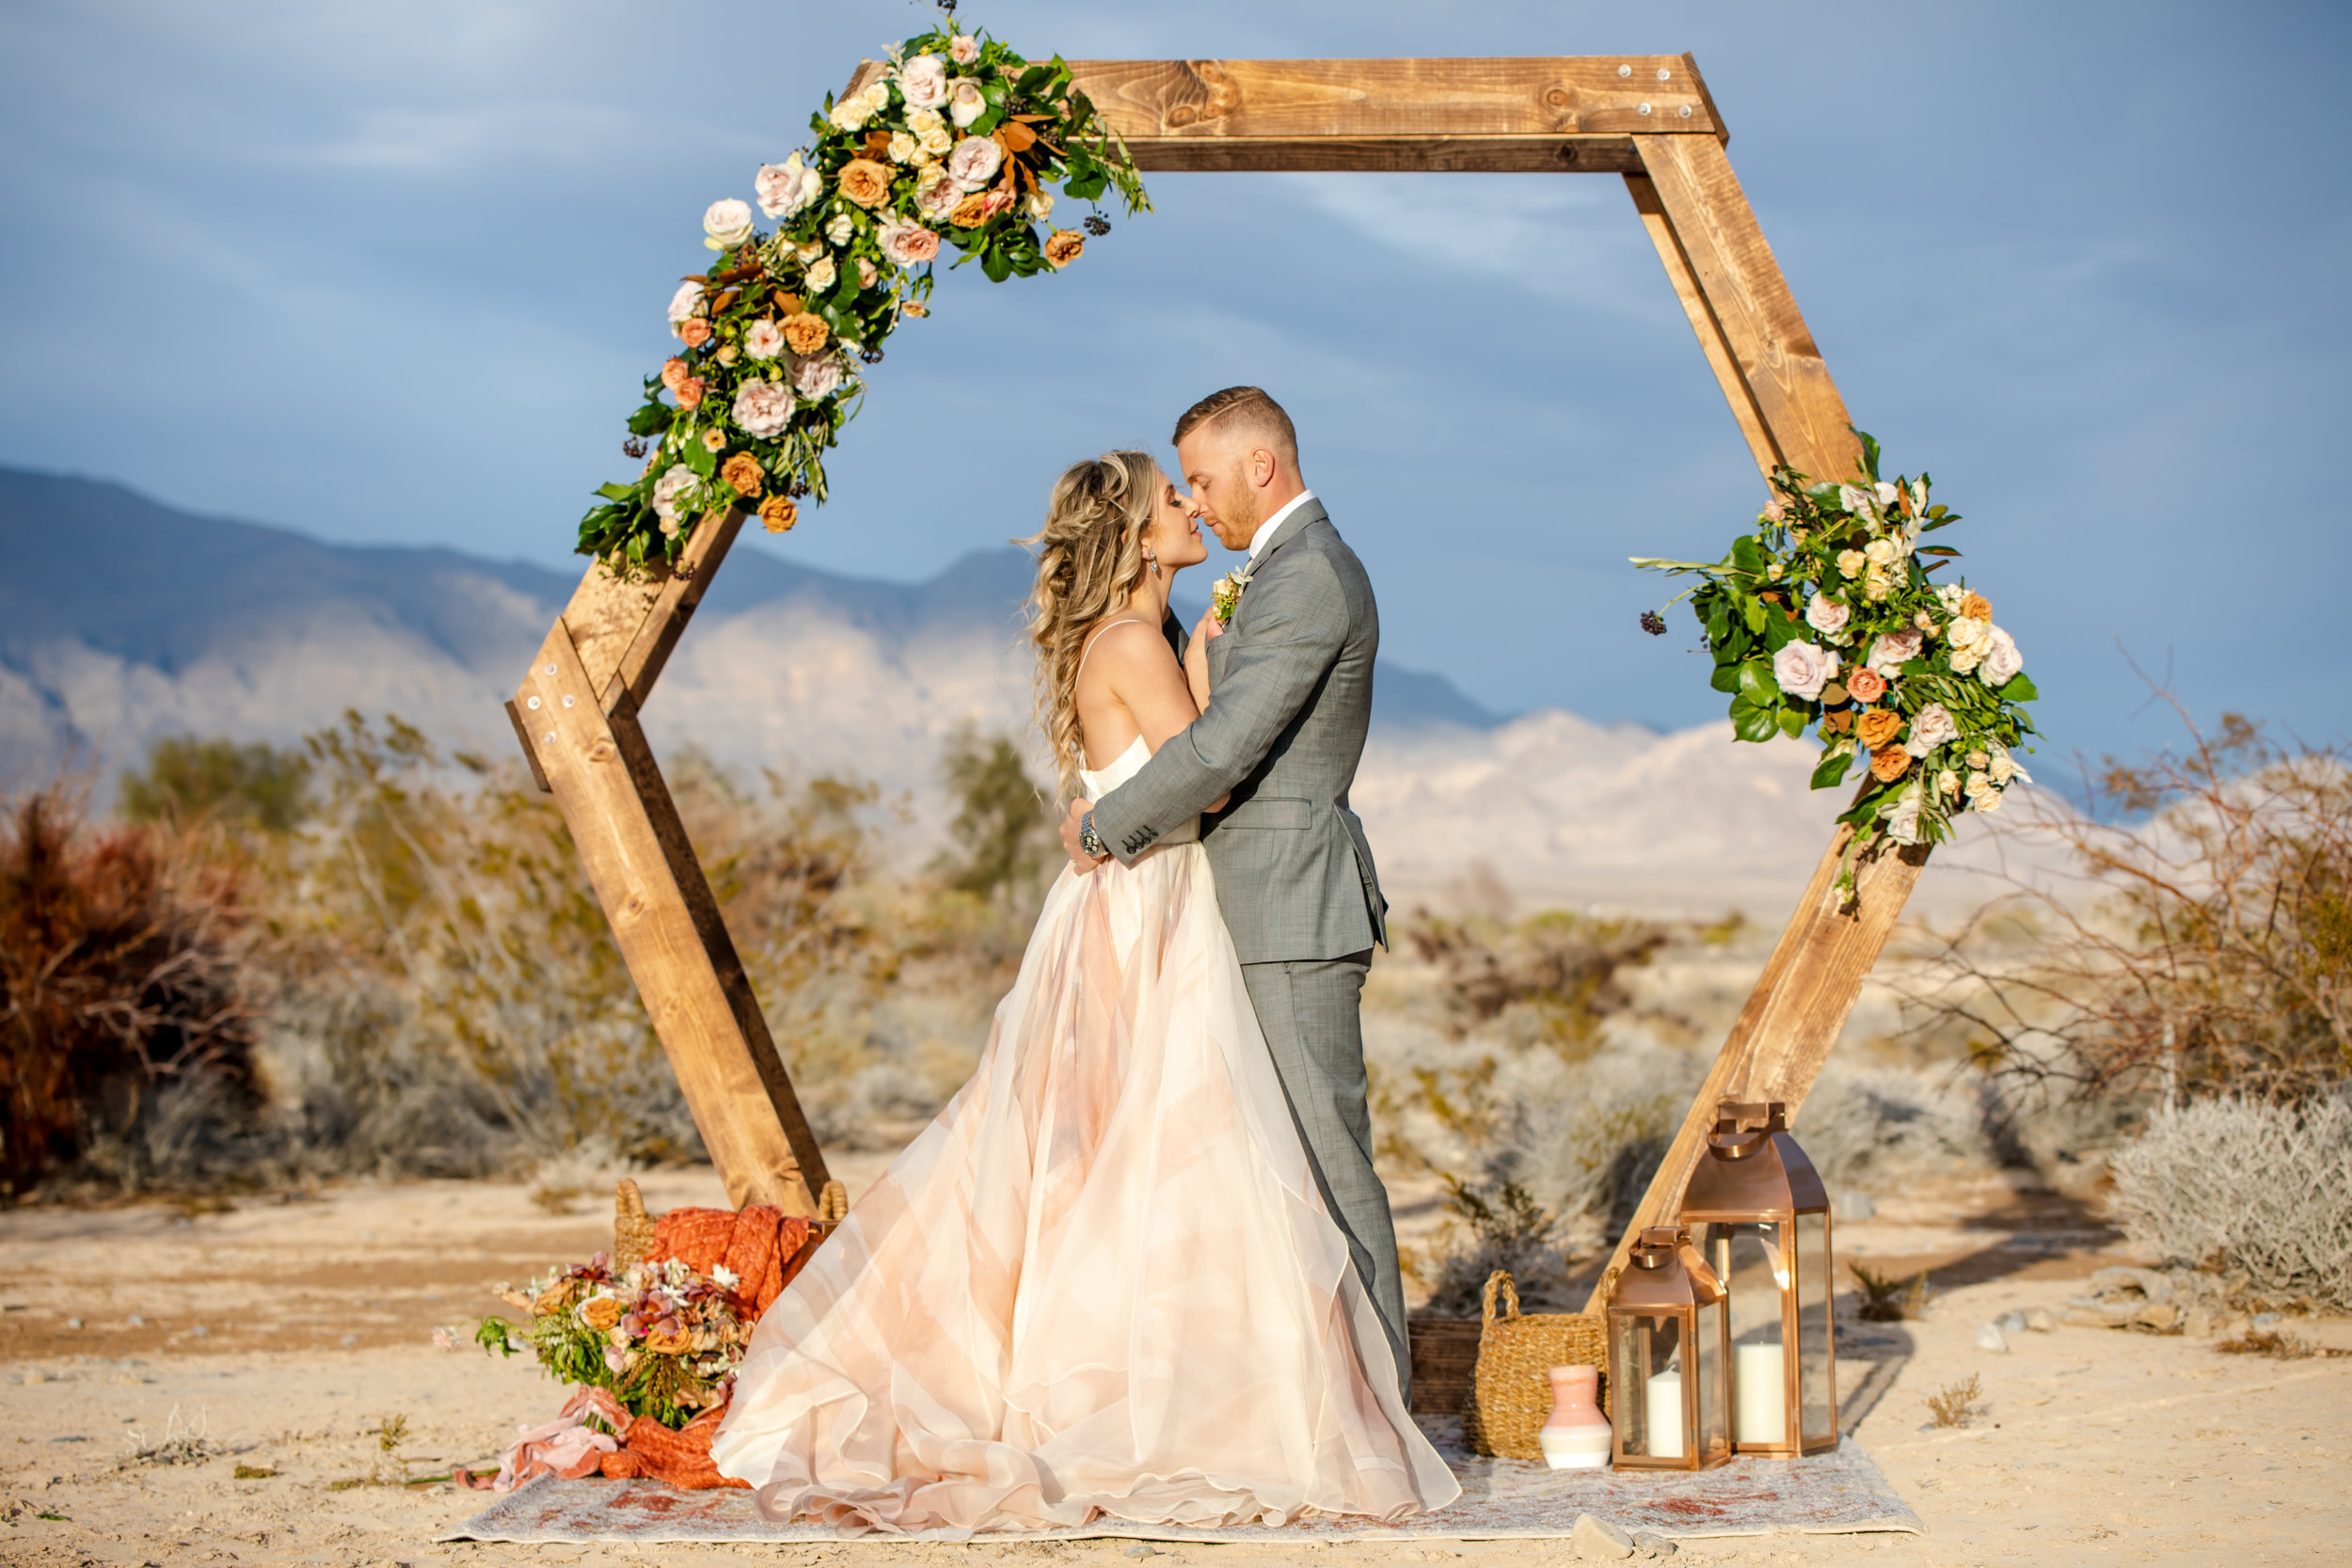 Hannah-cessna-photography-cleveland-ohio-wedding-photograper-Las-Vegas-Nevada-Red-Rocks_0143.jpg